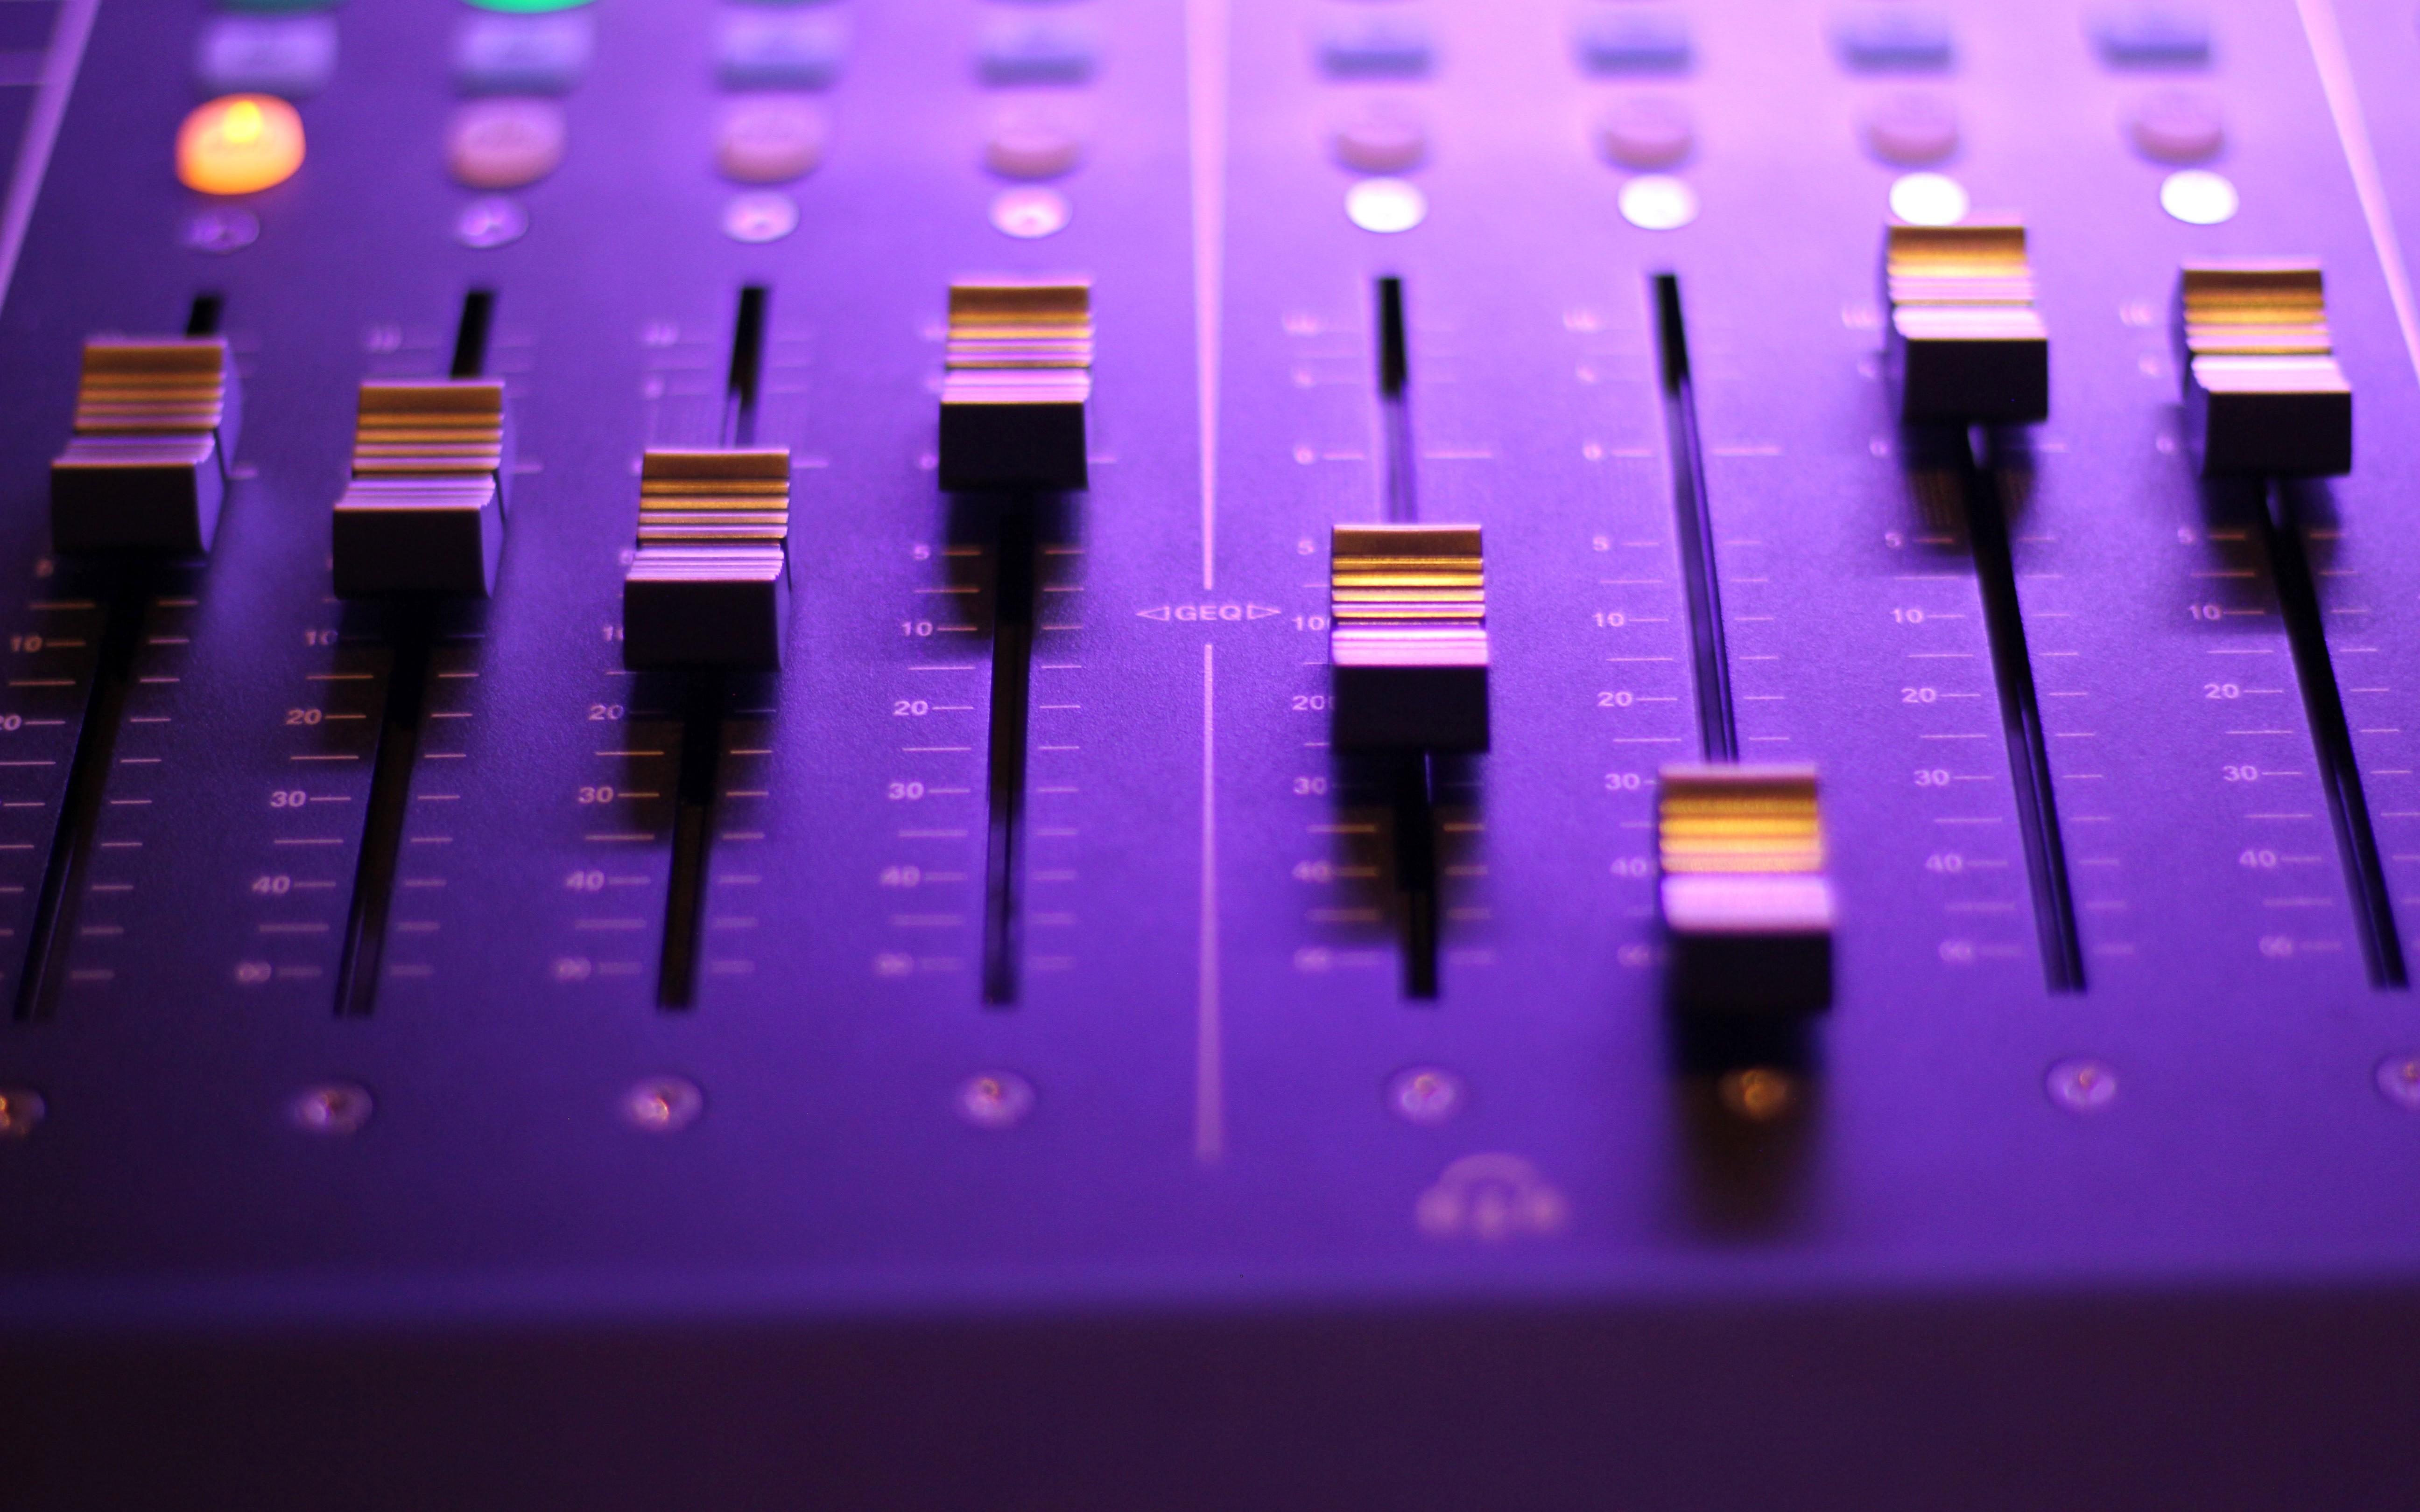 Sound Classification With TensorFlow - DZone AI